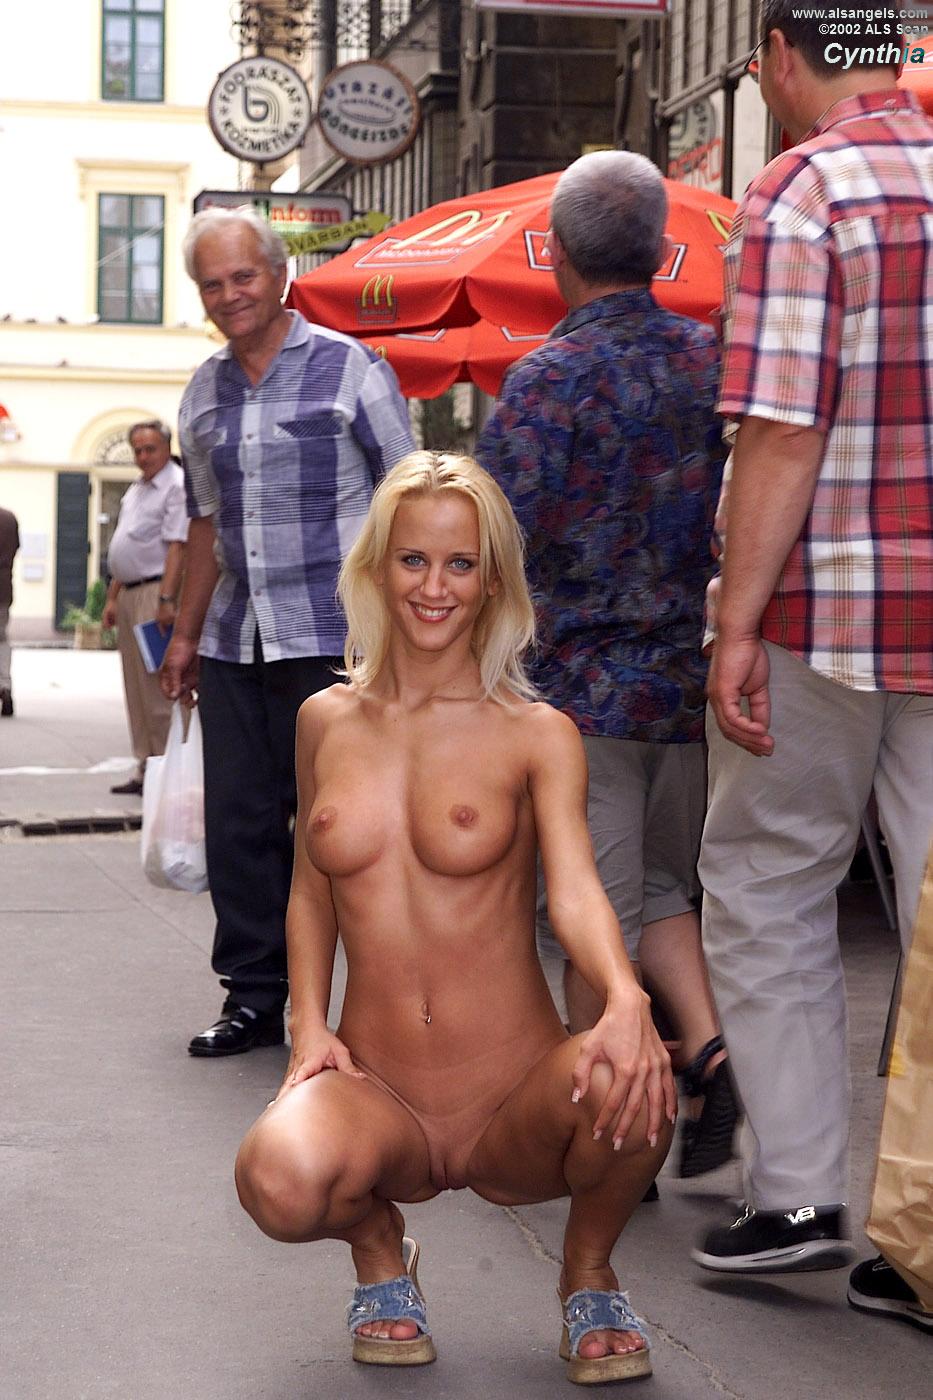 blonde nude in public Cynthia